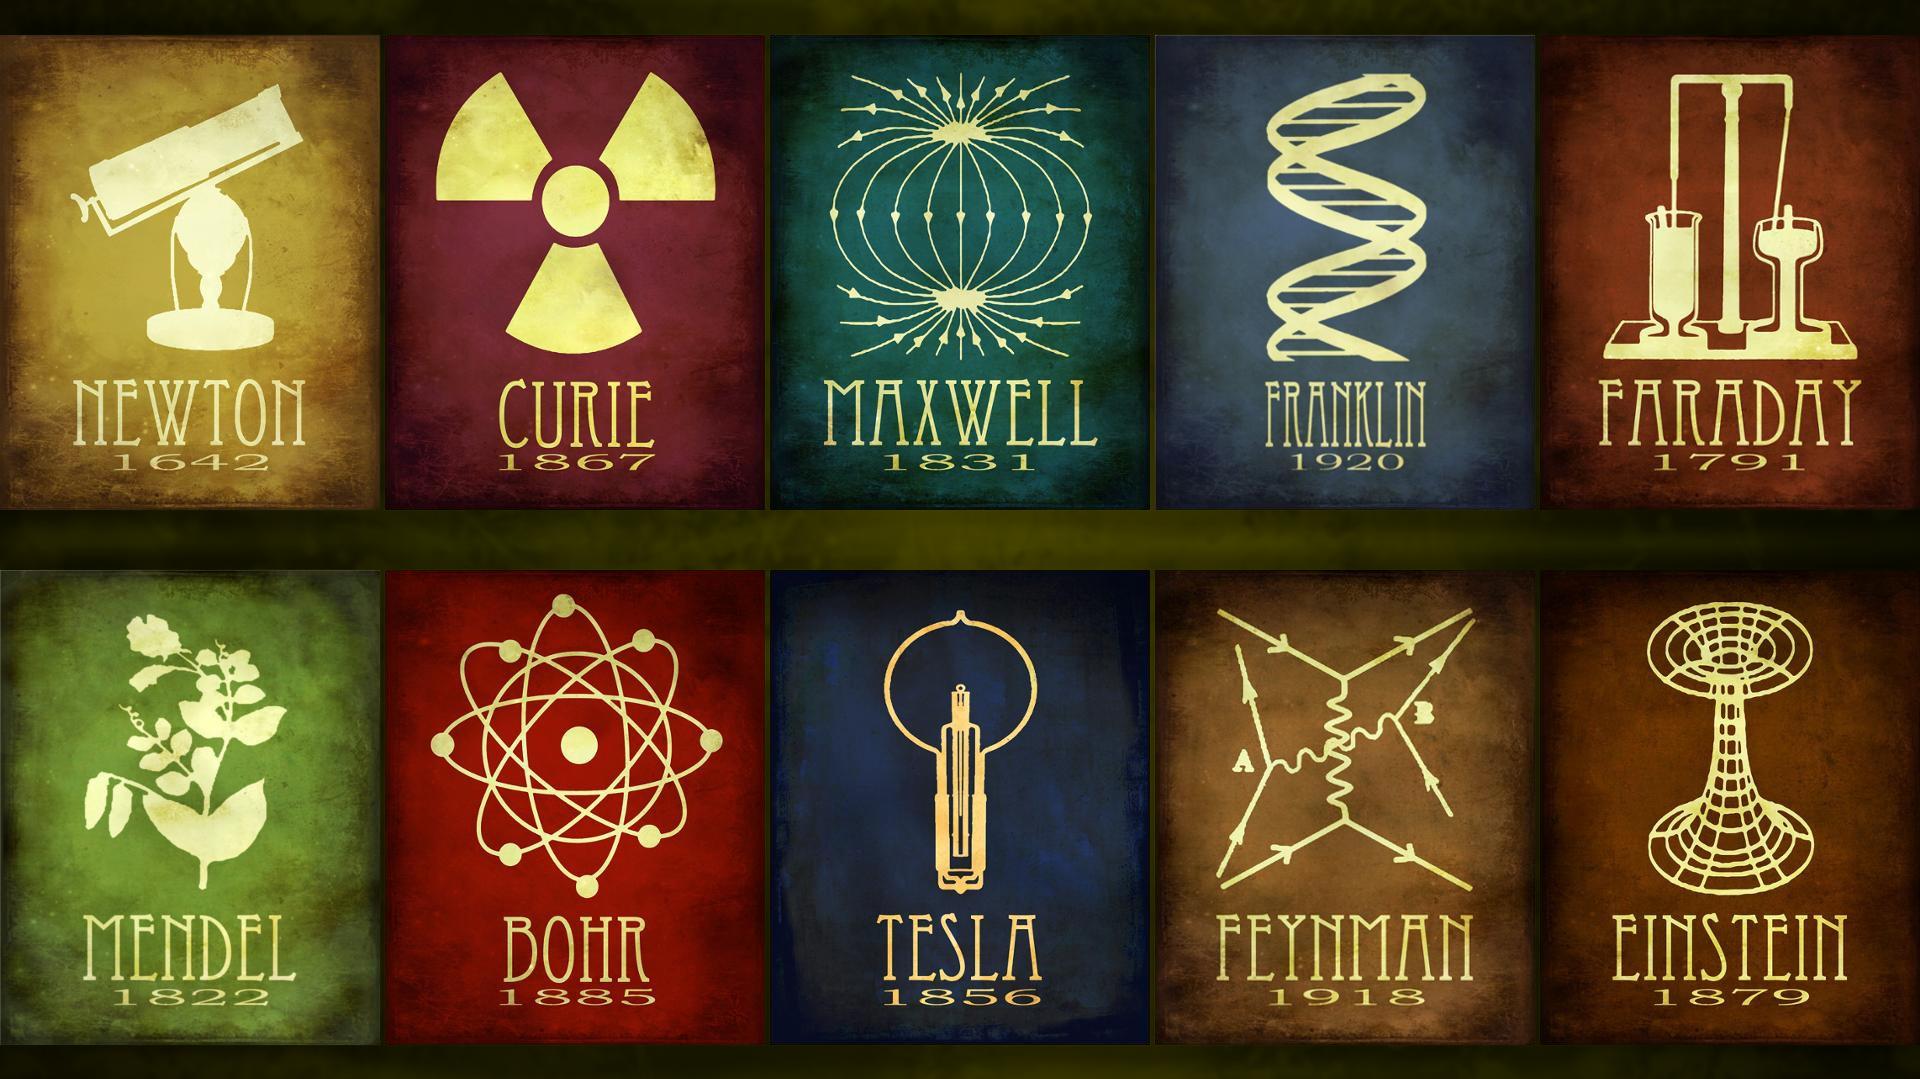 Fondos De Pantalla Ciencia Isaac Newton Faraday Niels